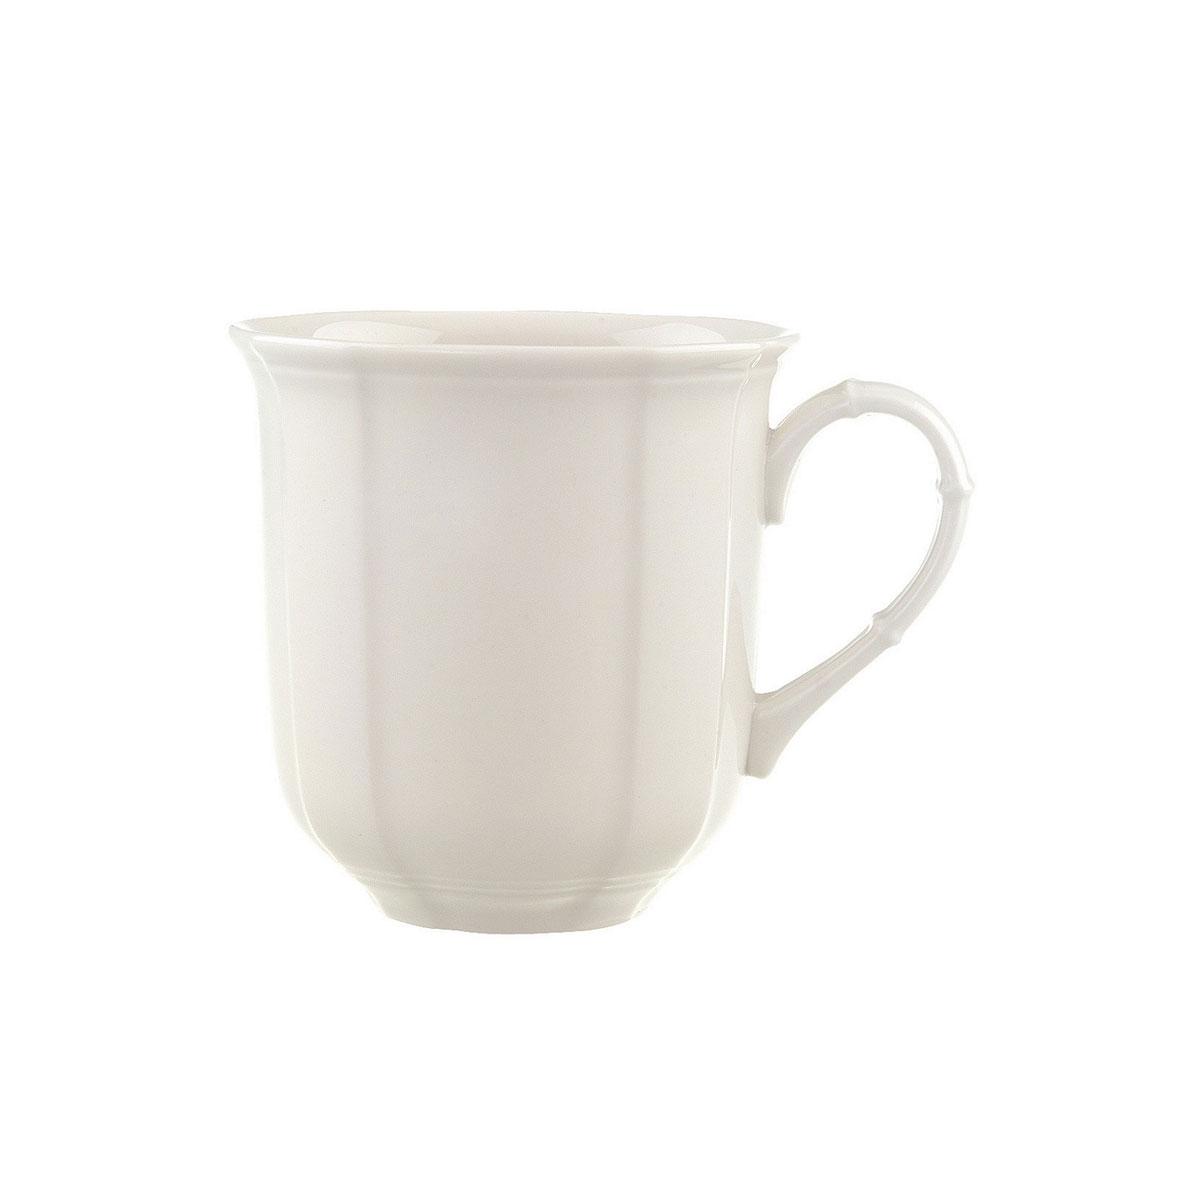 Villeroy and Boch Manoir Mug, Single